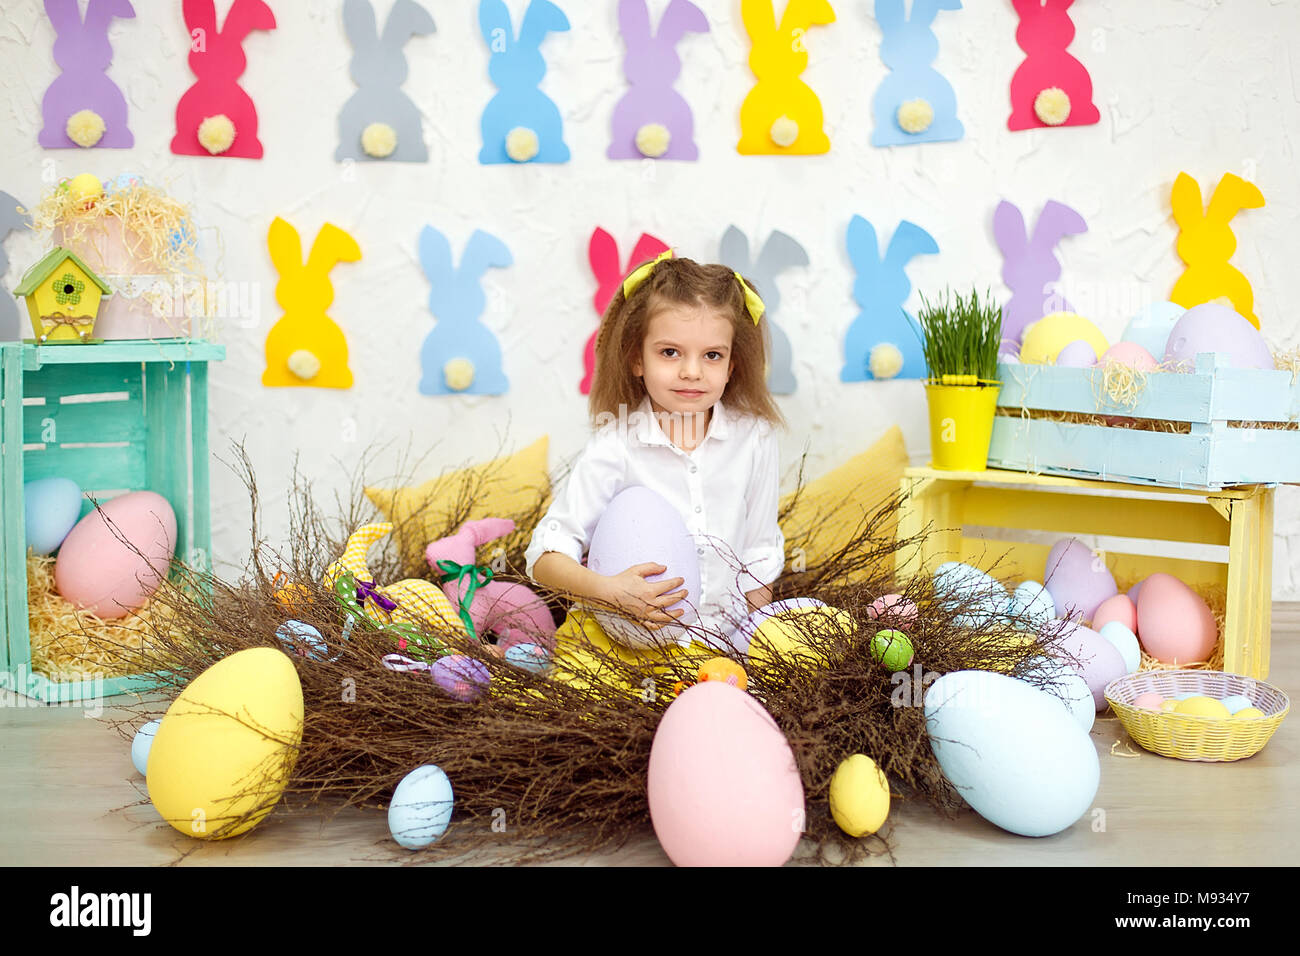 Big Green Egg Stock Photos & Big Green Egg Stock Images ...